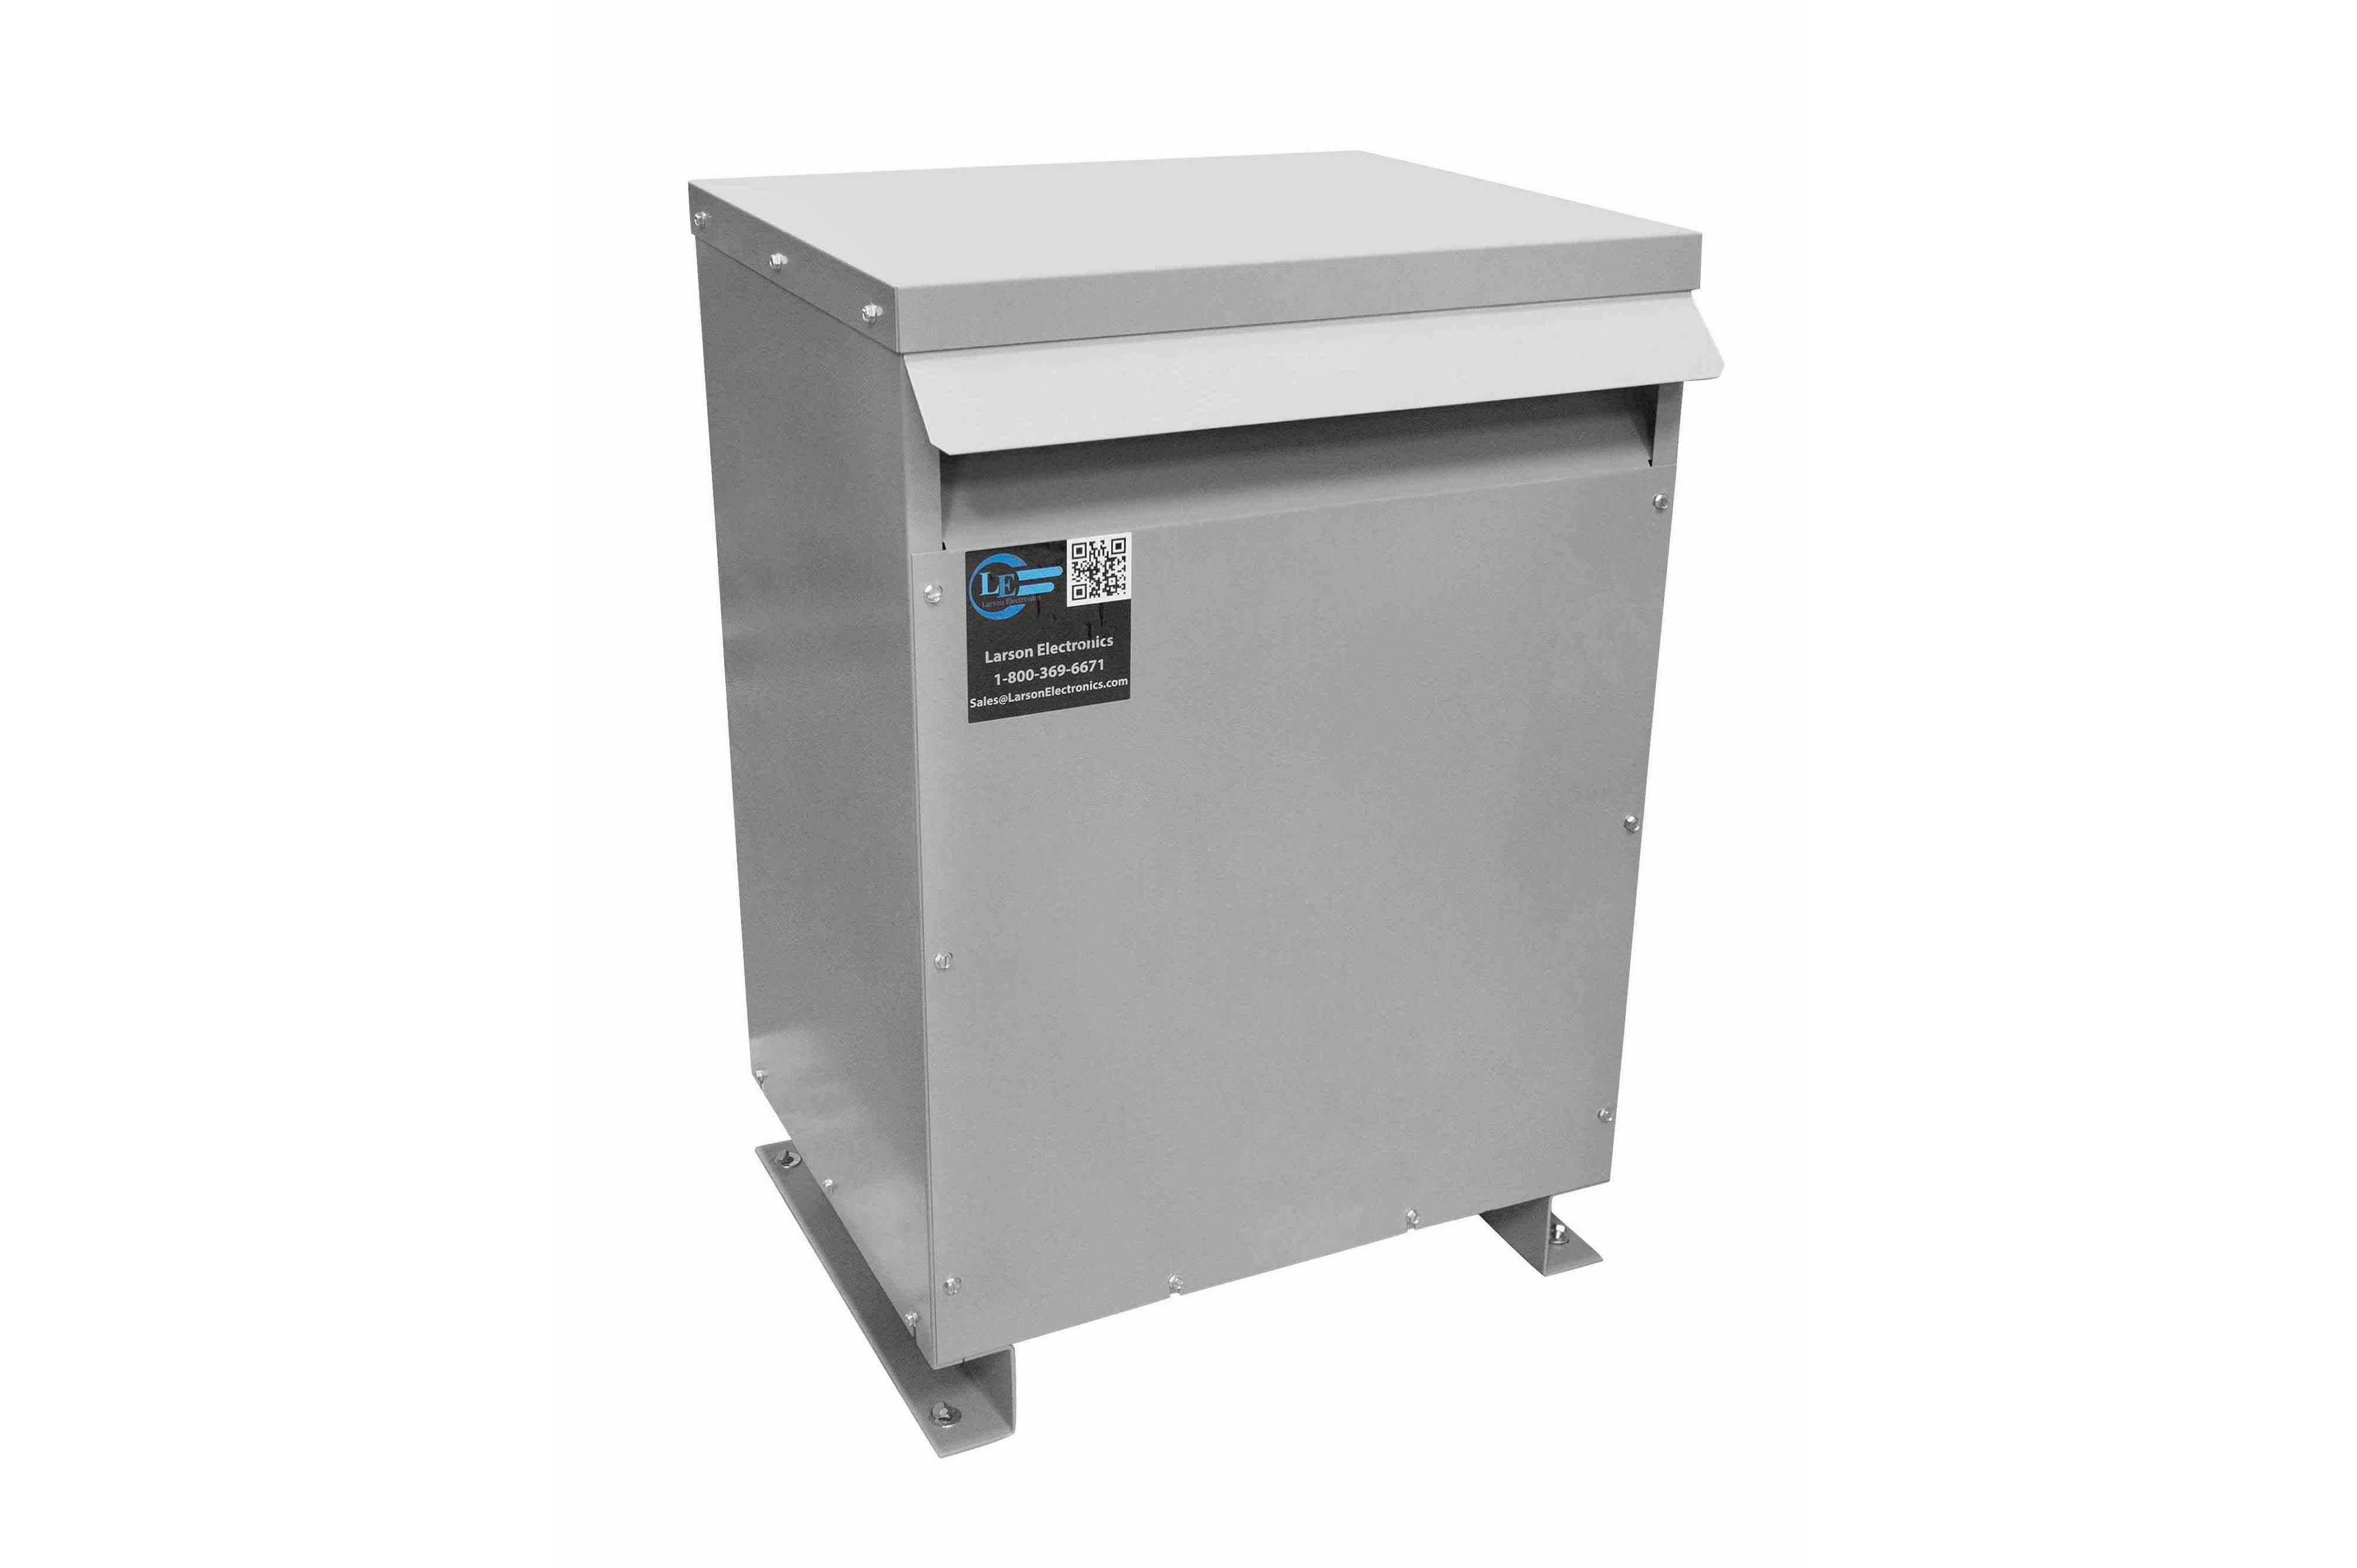 25 kVA 3PH Isolation Transformer, 575V Wye Primary, 380V Delta Secondary, N3R, Ventilated, 60 Hz